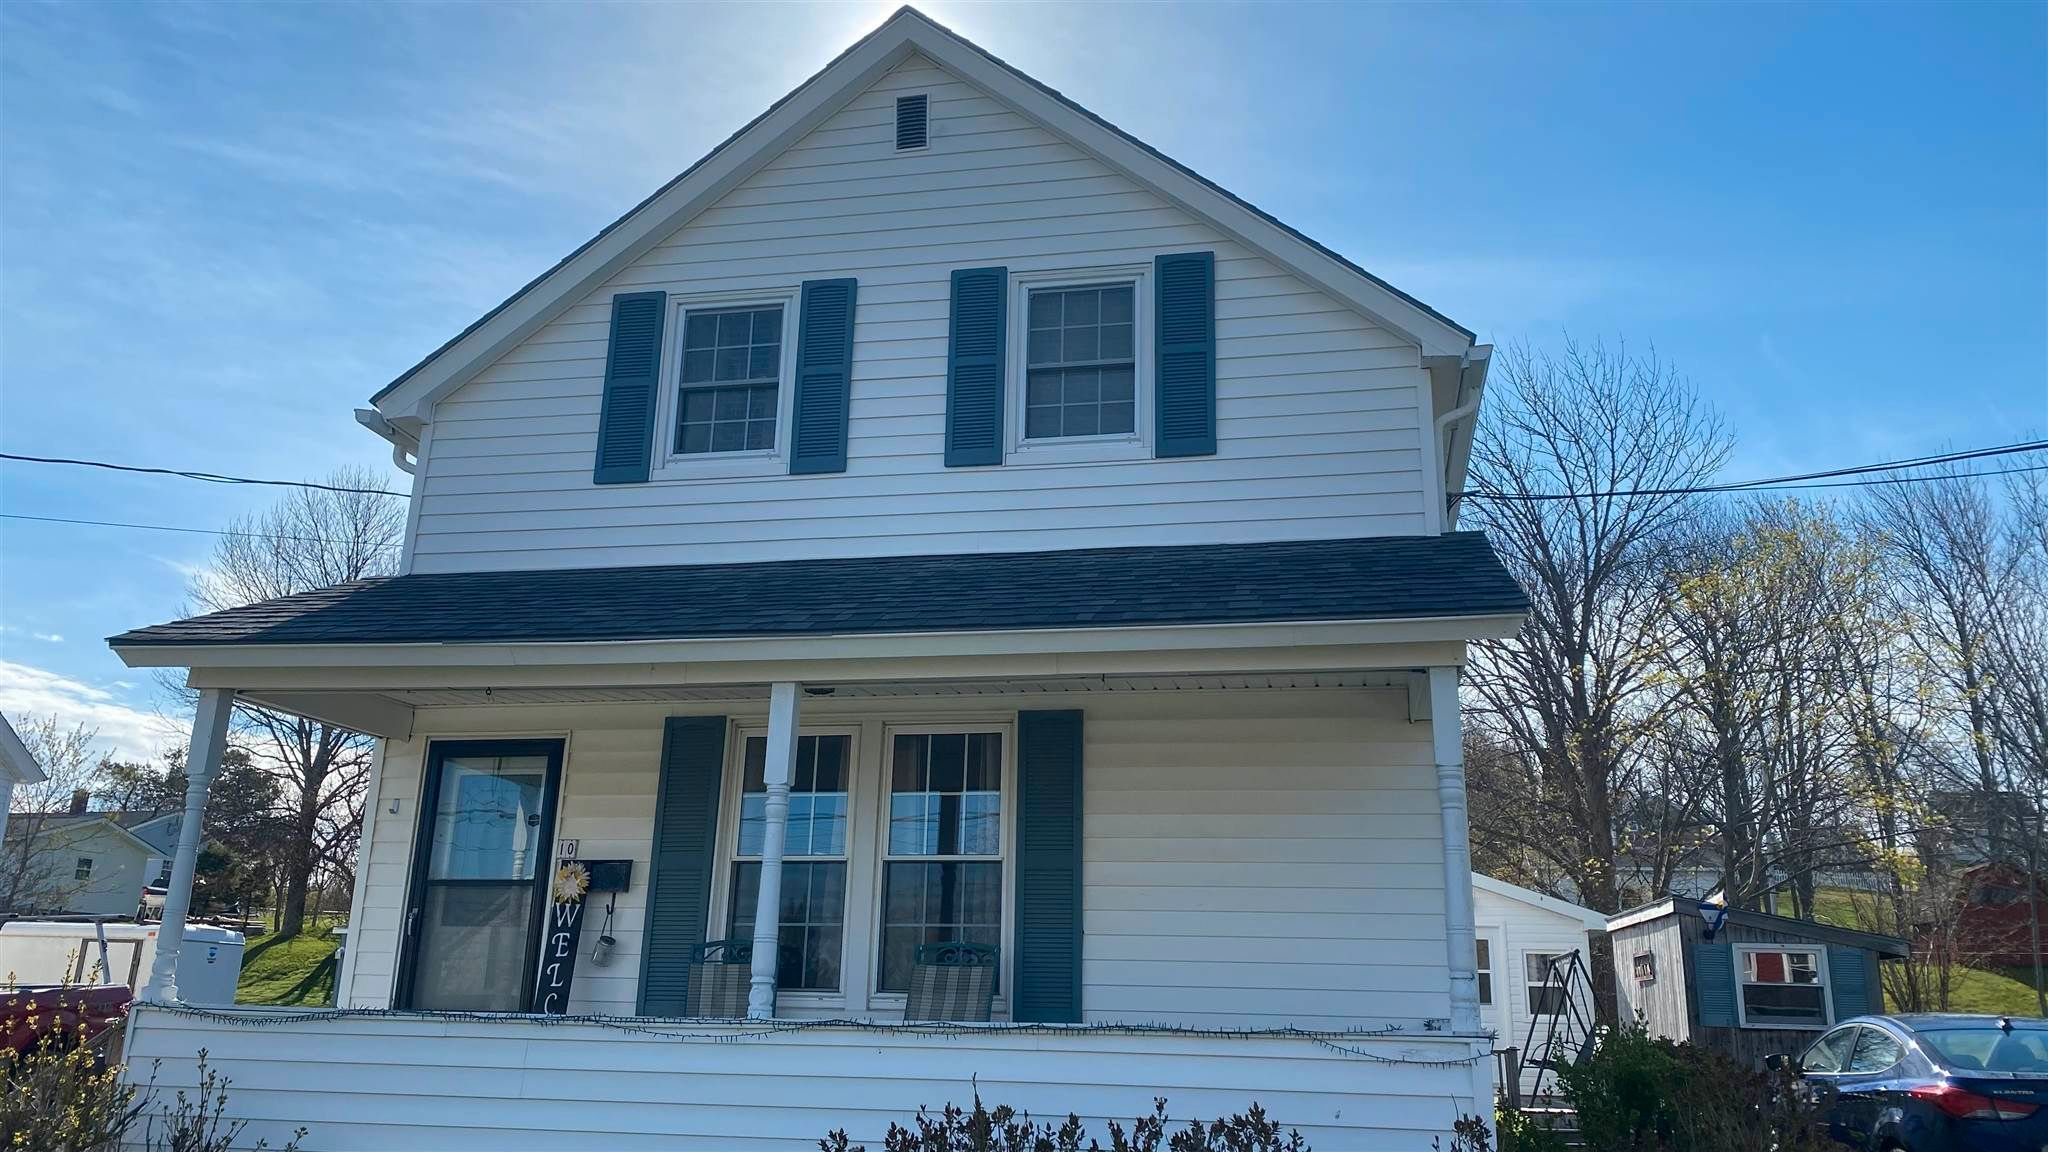 Main Photo: 10 Seventh Street in Trenton: 107-Trenton,Westville,Pictou Residential for sale (Northern Region)  : MLS®# 202111585